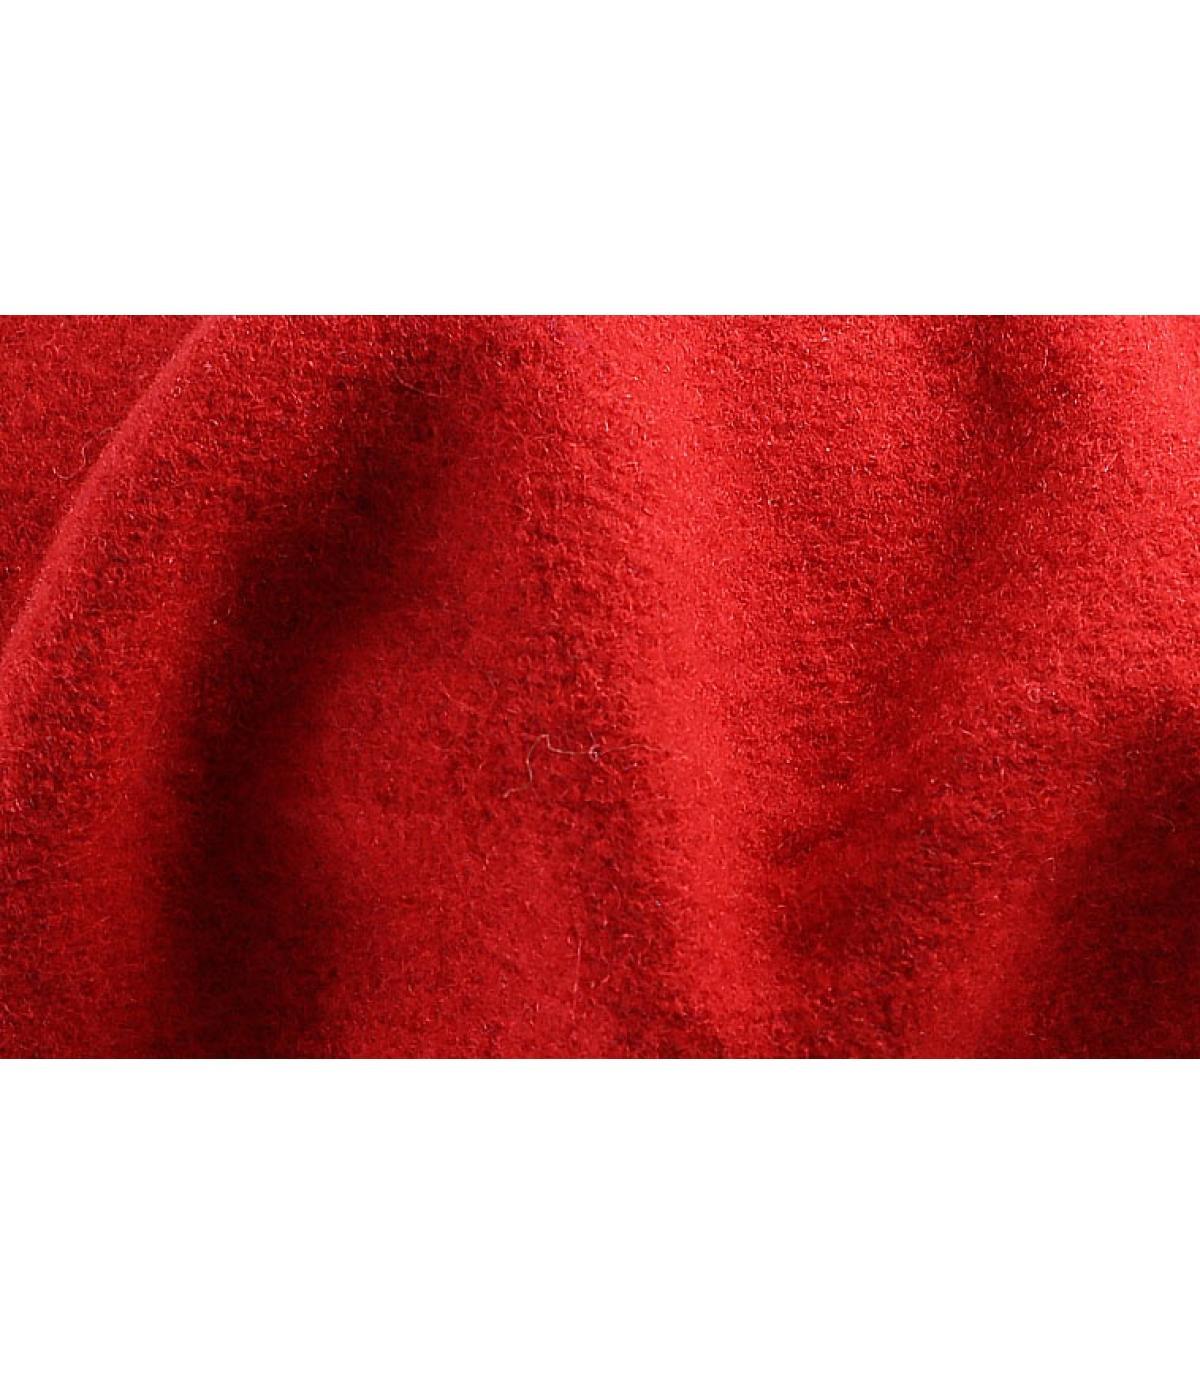 Detalles Red french beret imagen 3